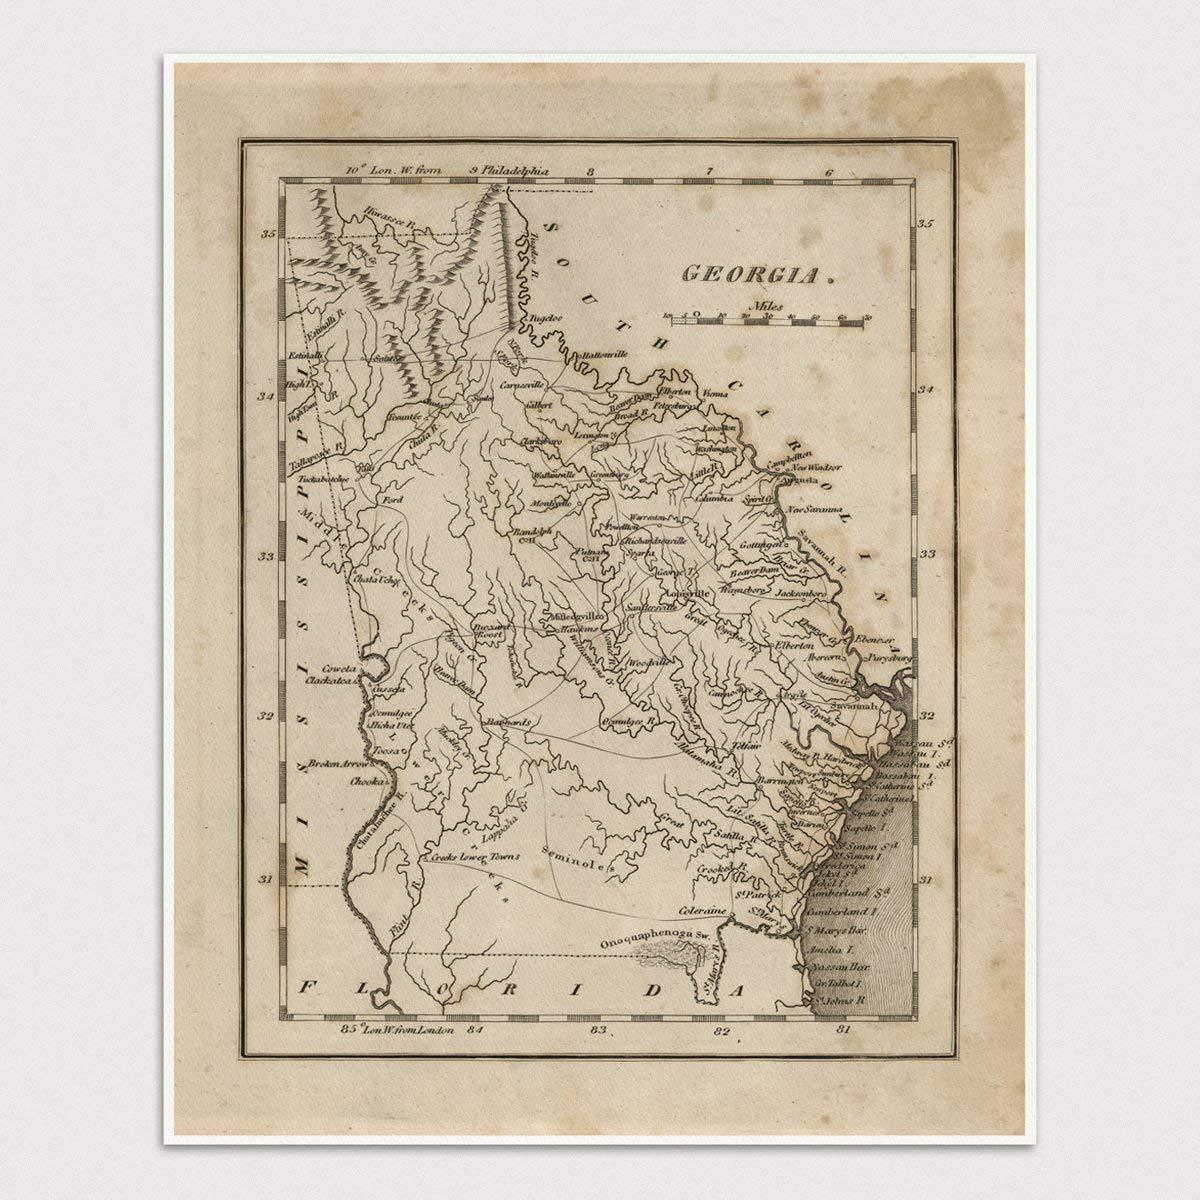 Map Of Old Georgia.Amazon Com Old Georgia Map Art Print 1816 Archival Reproduction